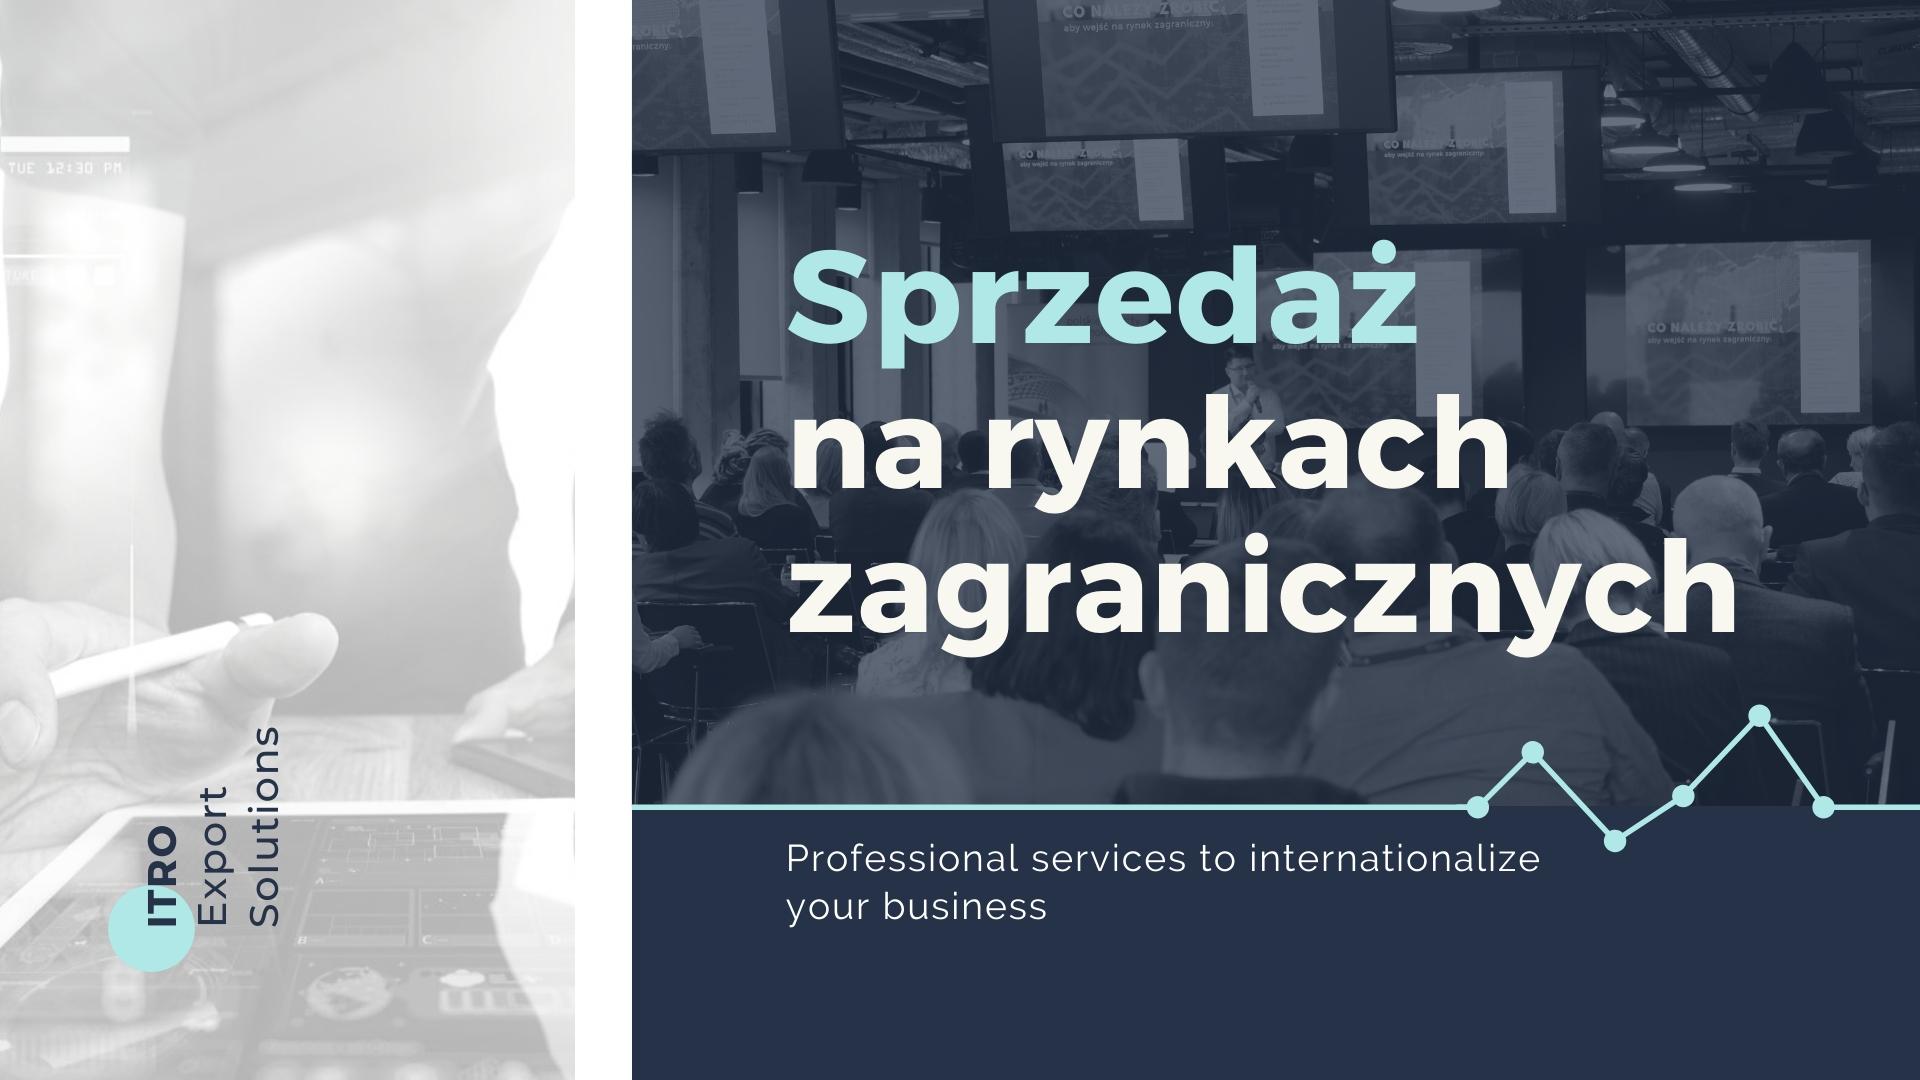 1_Professionalservicestointernationalizeyourbusiness_by ITRO_2020